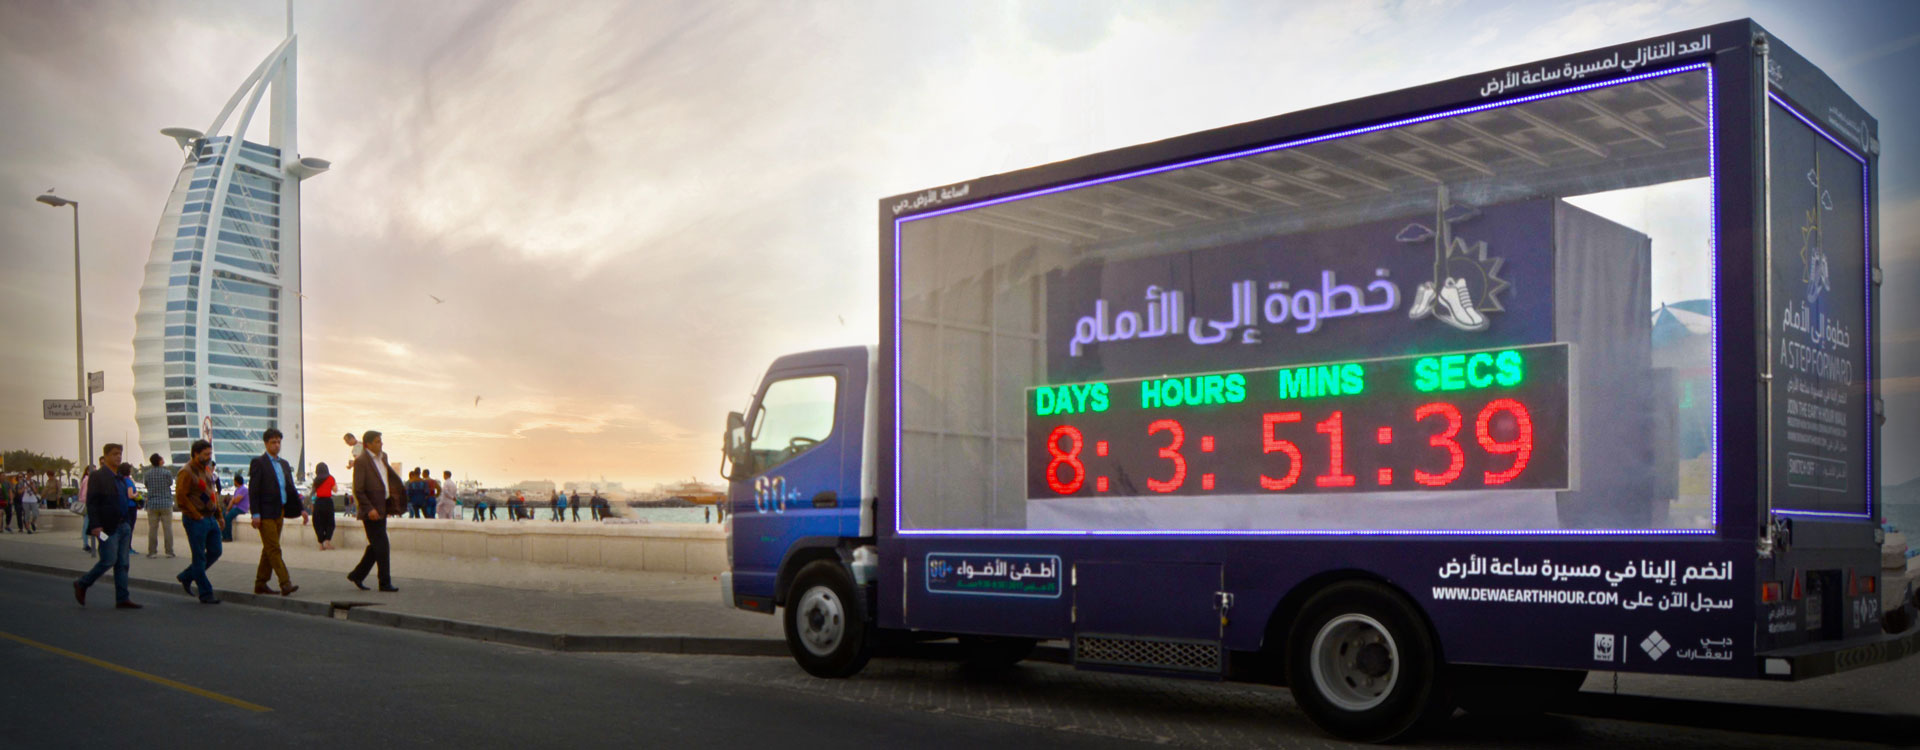 OOH advertising dubai, UAE